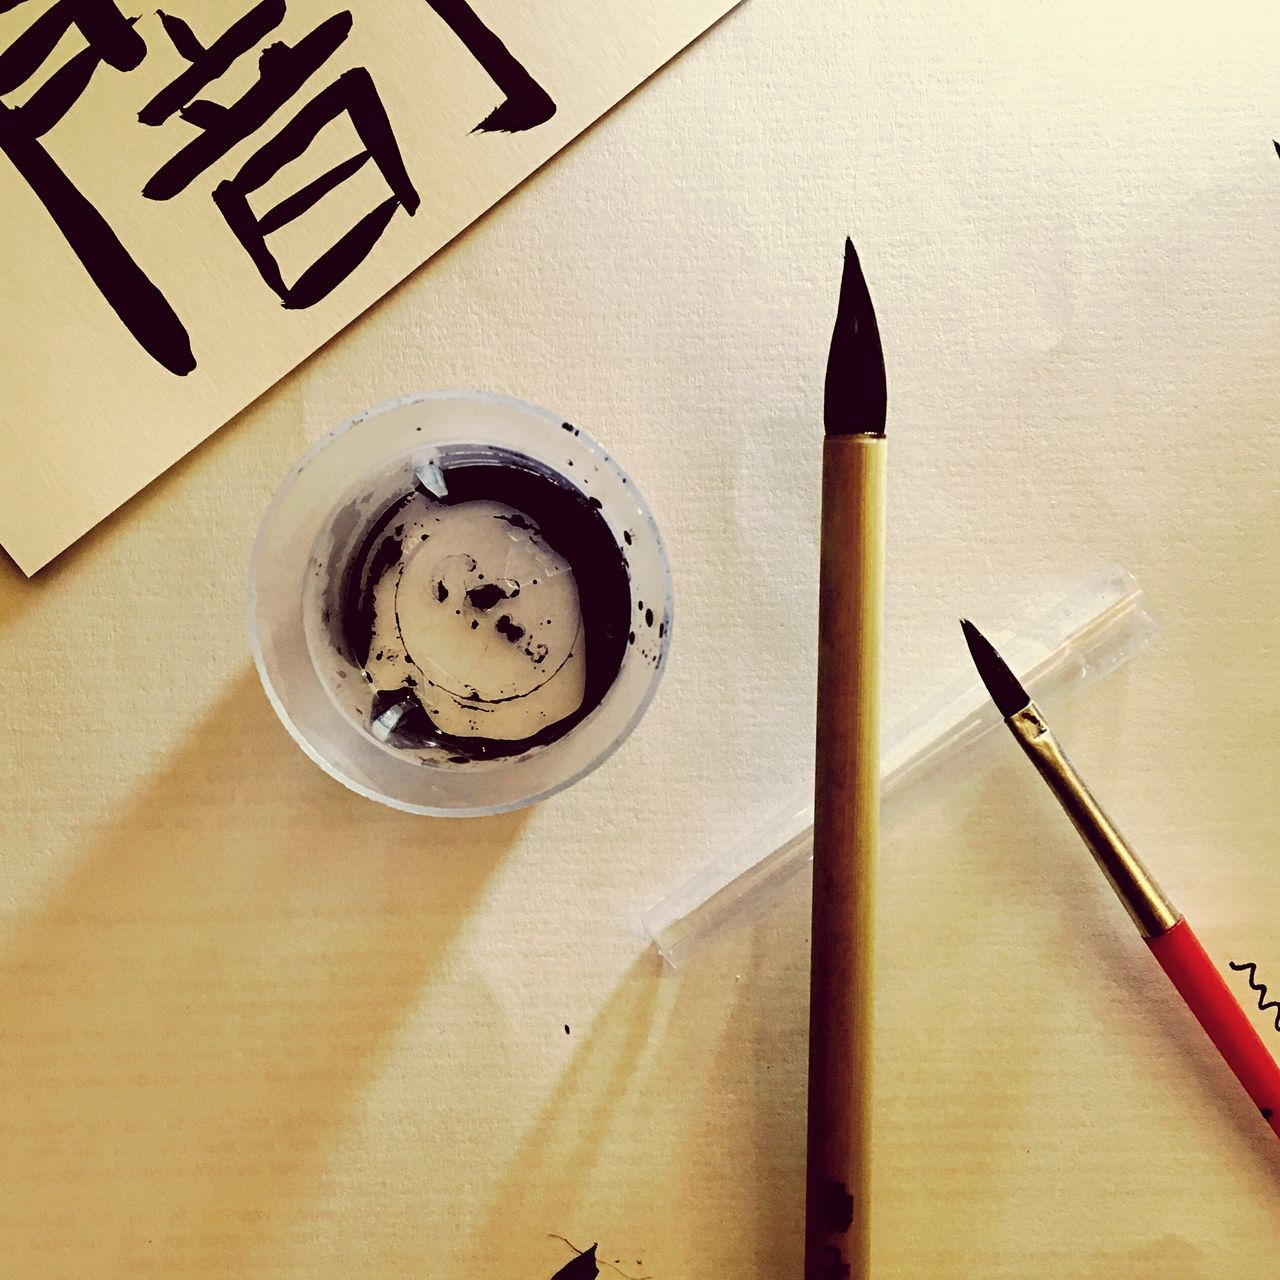 Writing Instrument No People Calligraphy Japanese  Japanese Culture Japanese Calligraphy Pencil Ink Bokuteki Gloom Get Dark Disorder